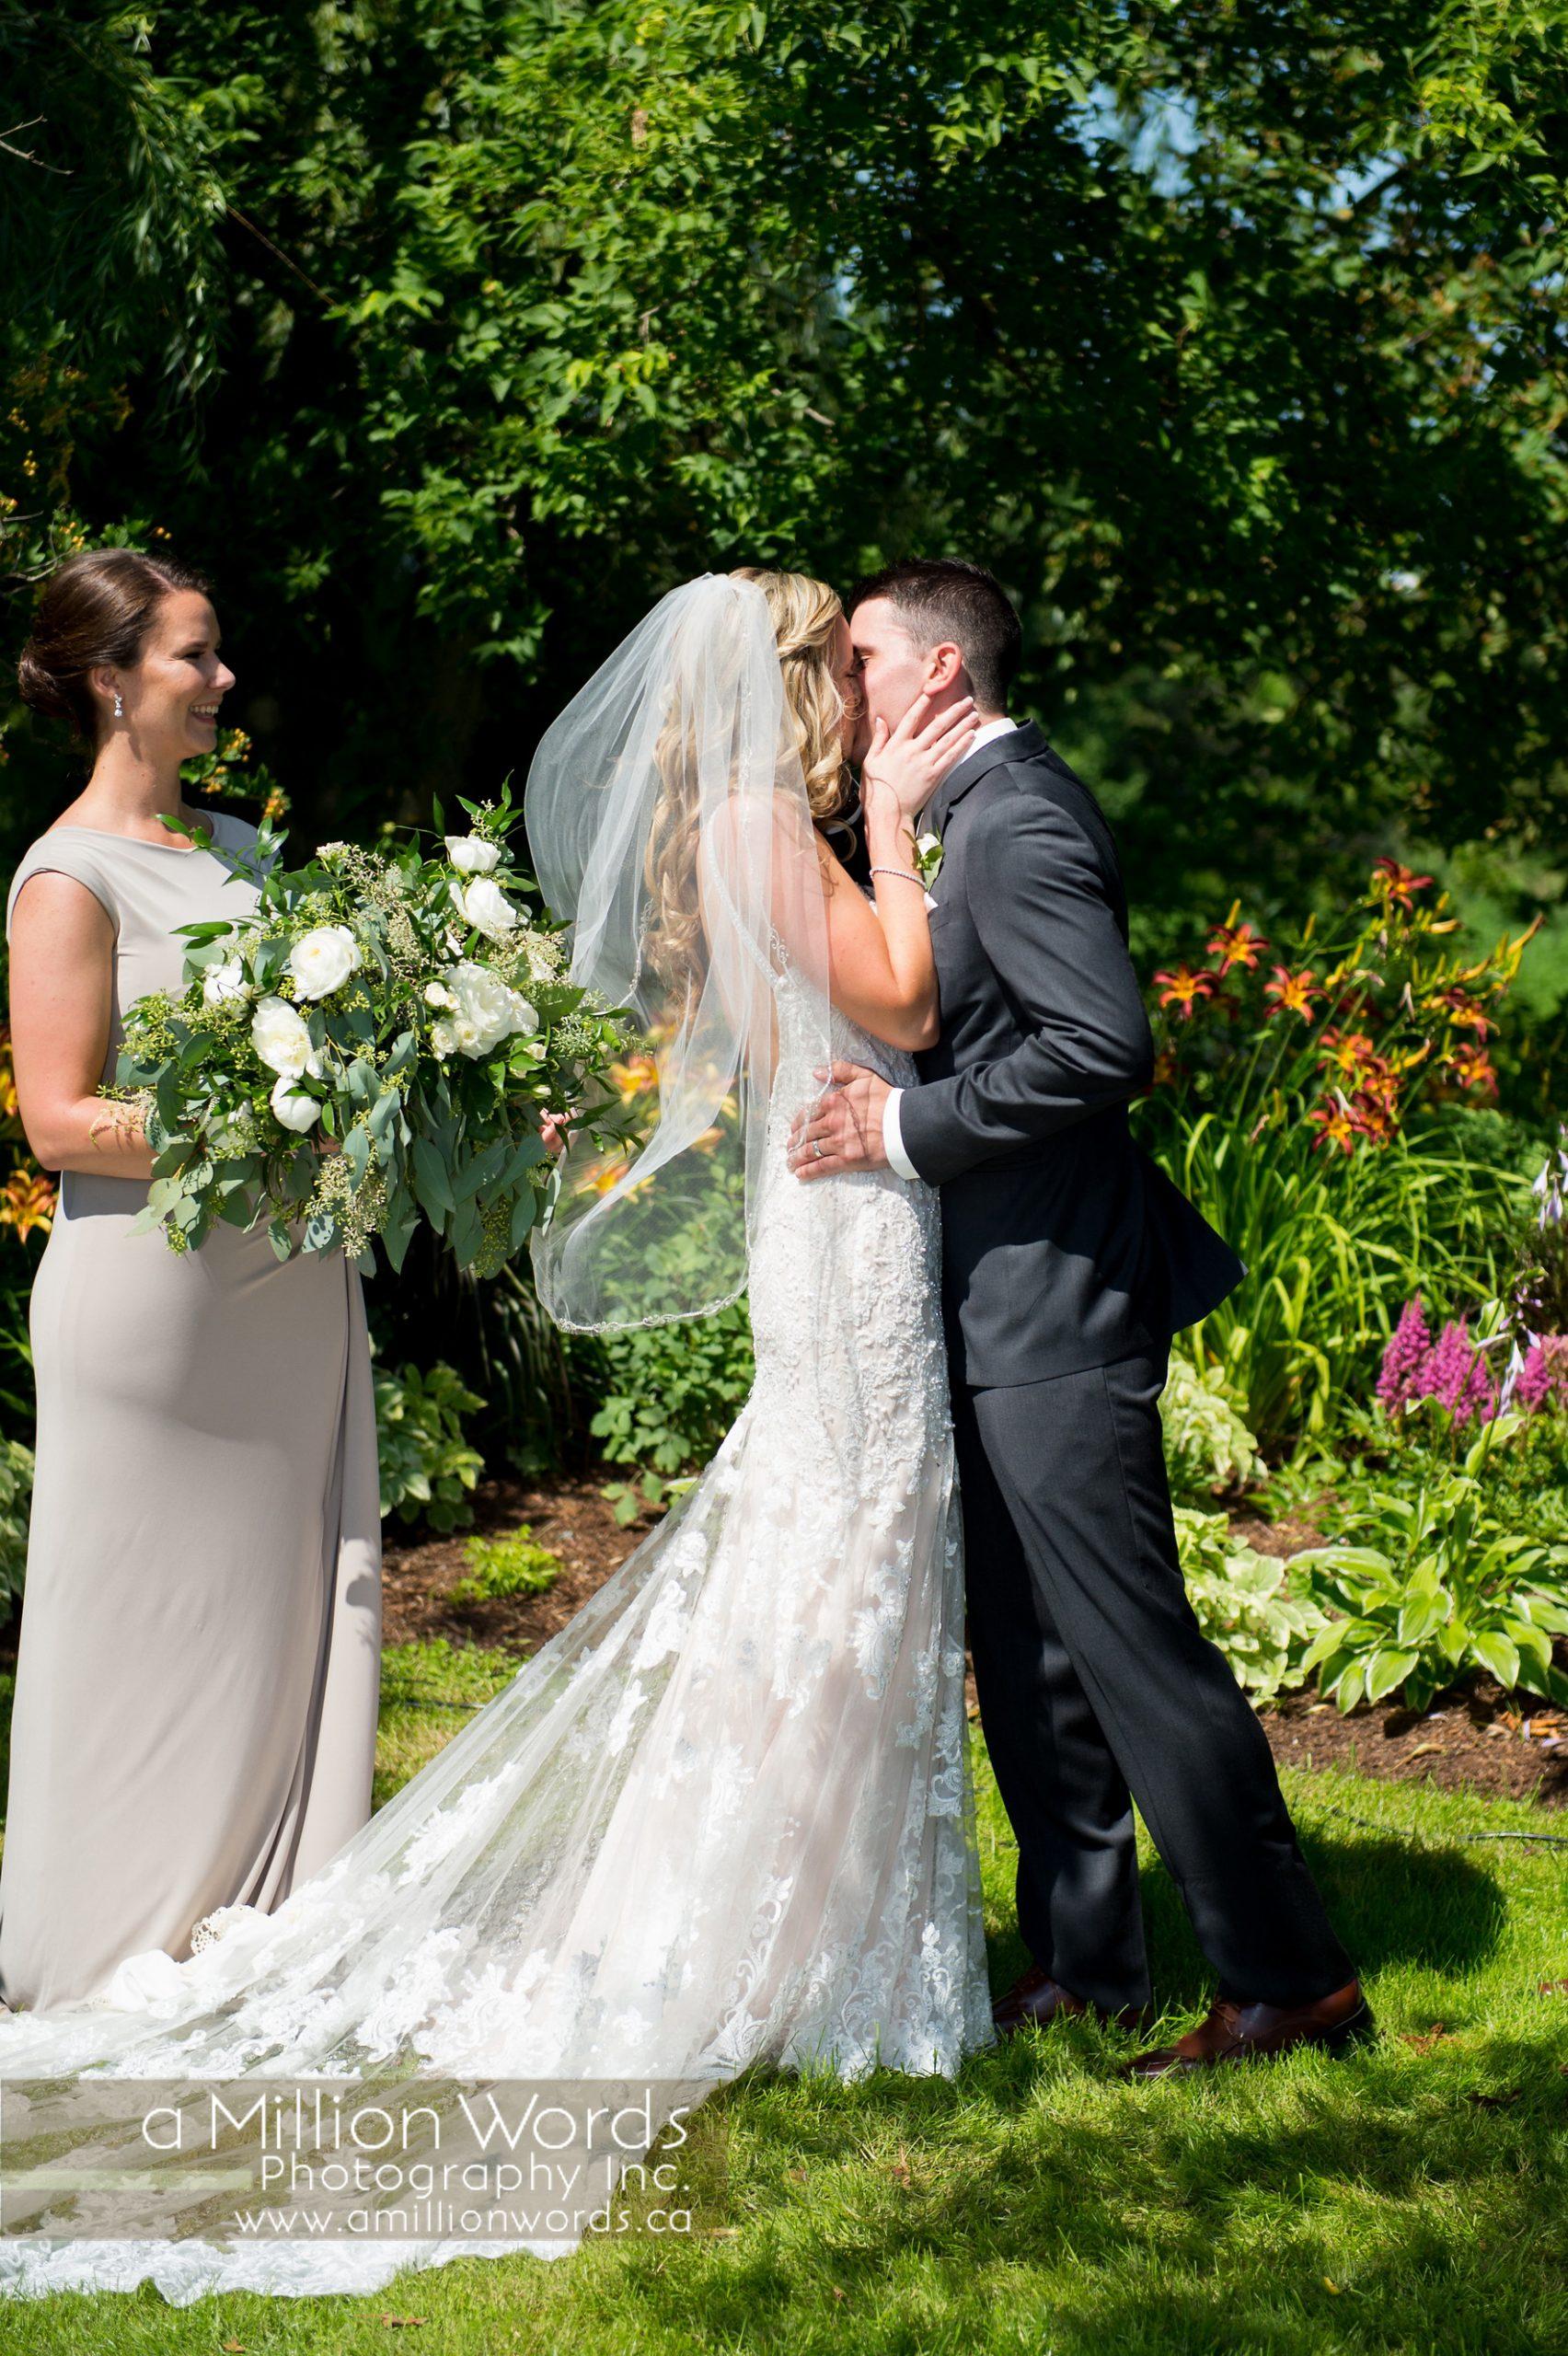 arthur_wedding_photographer34